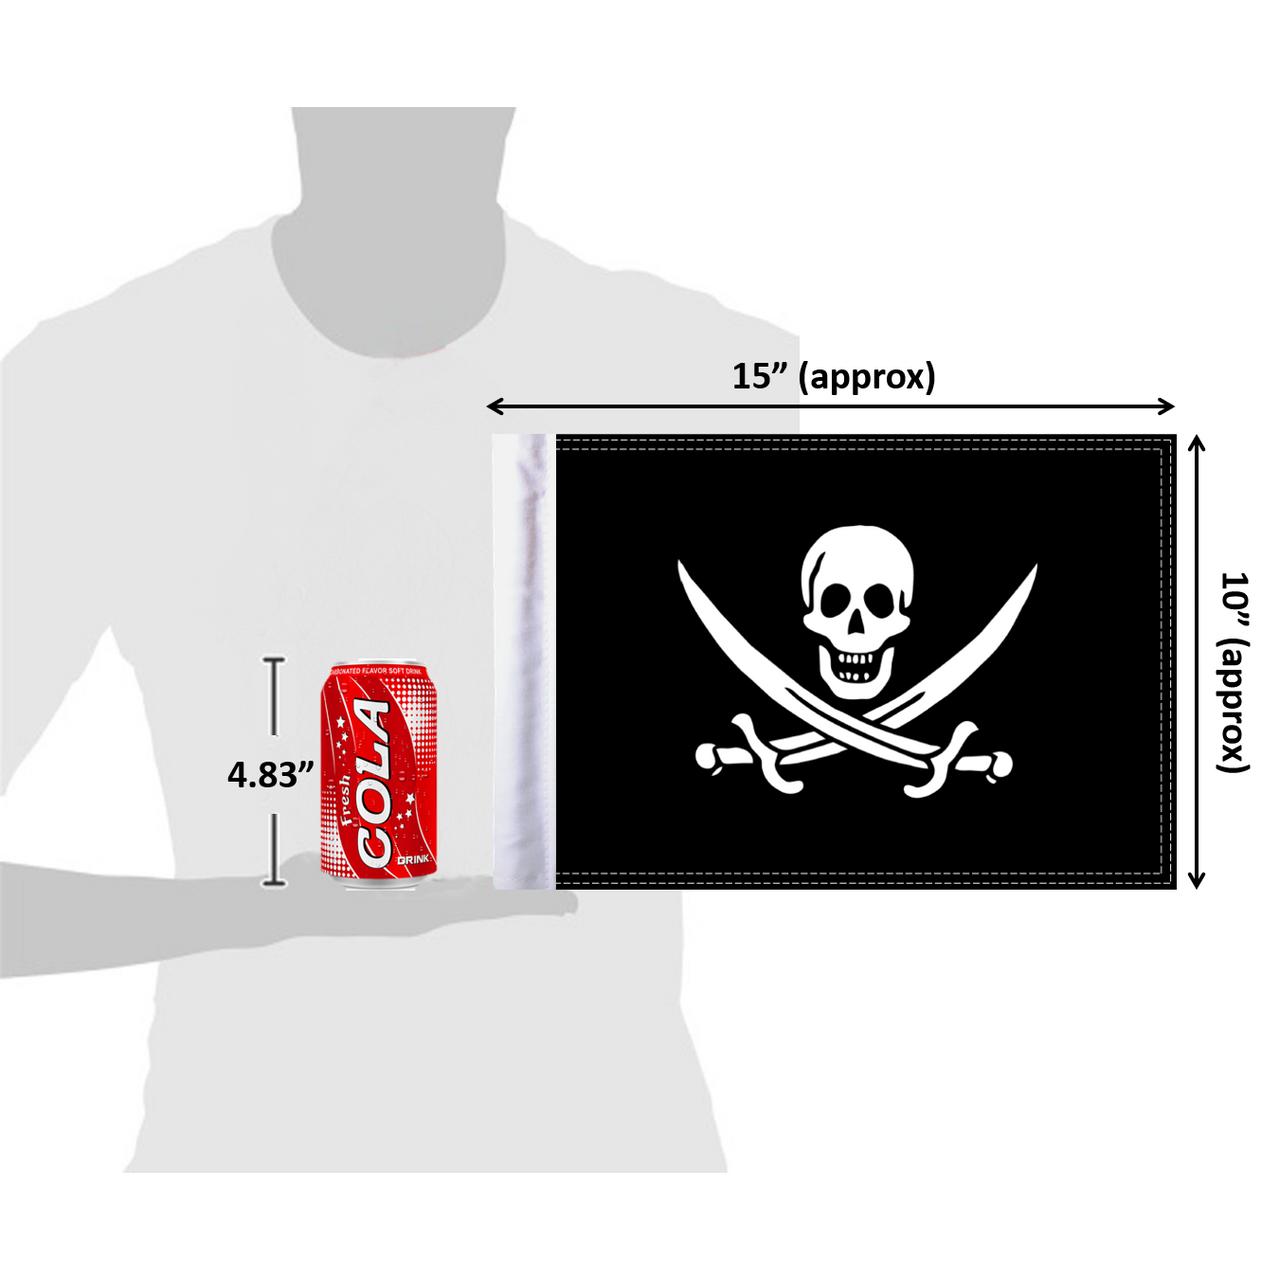 "10""x15"" Calico Jack Pirate flag (size comparison view)"